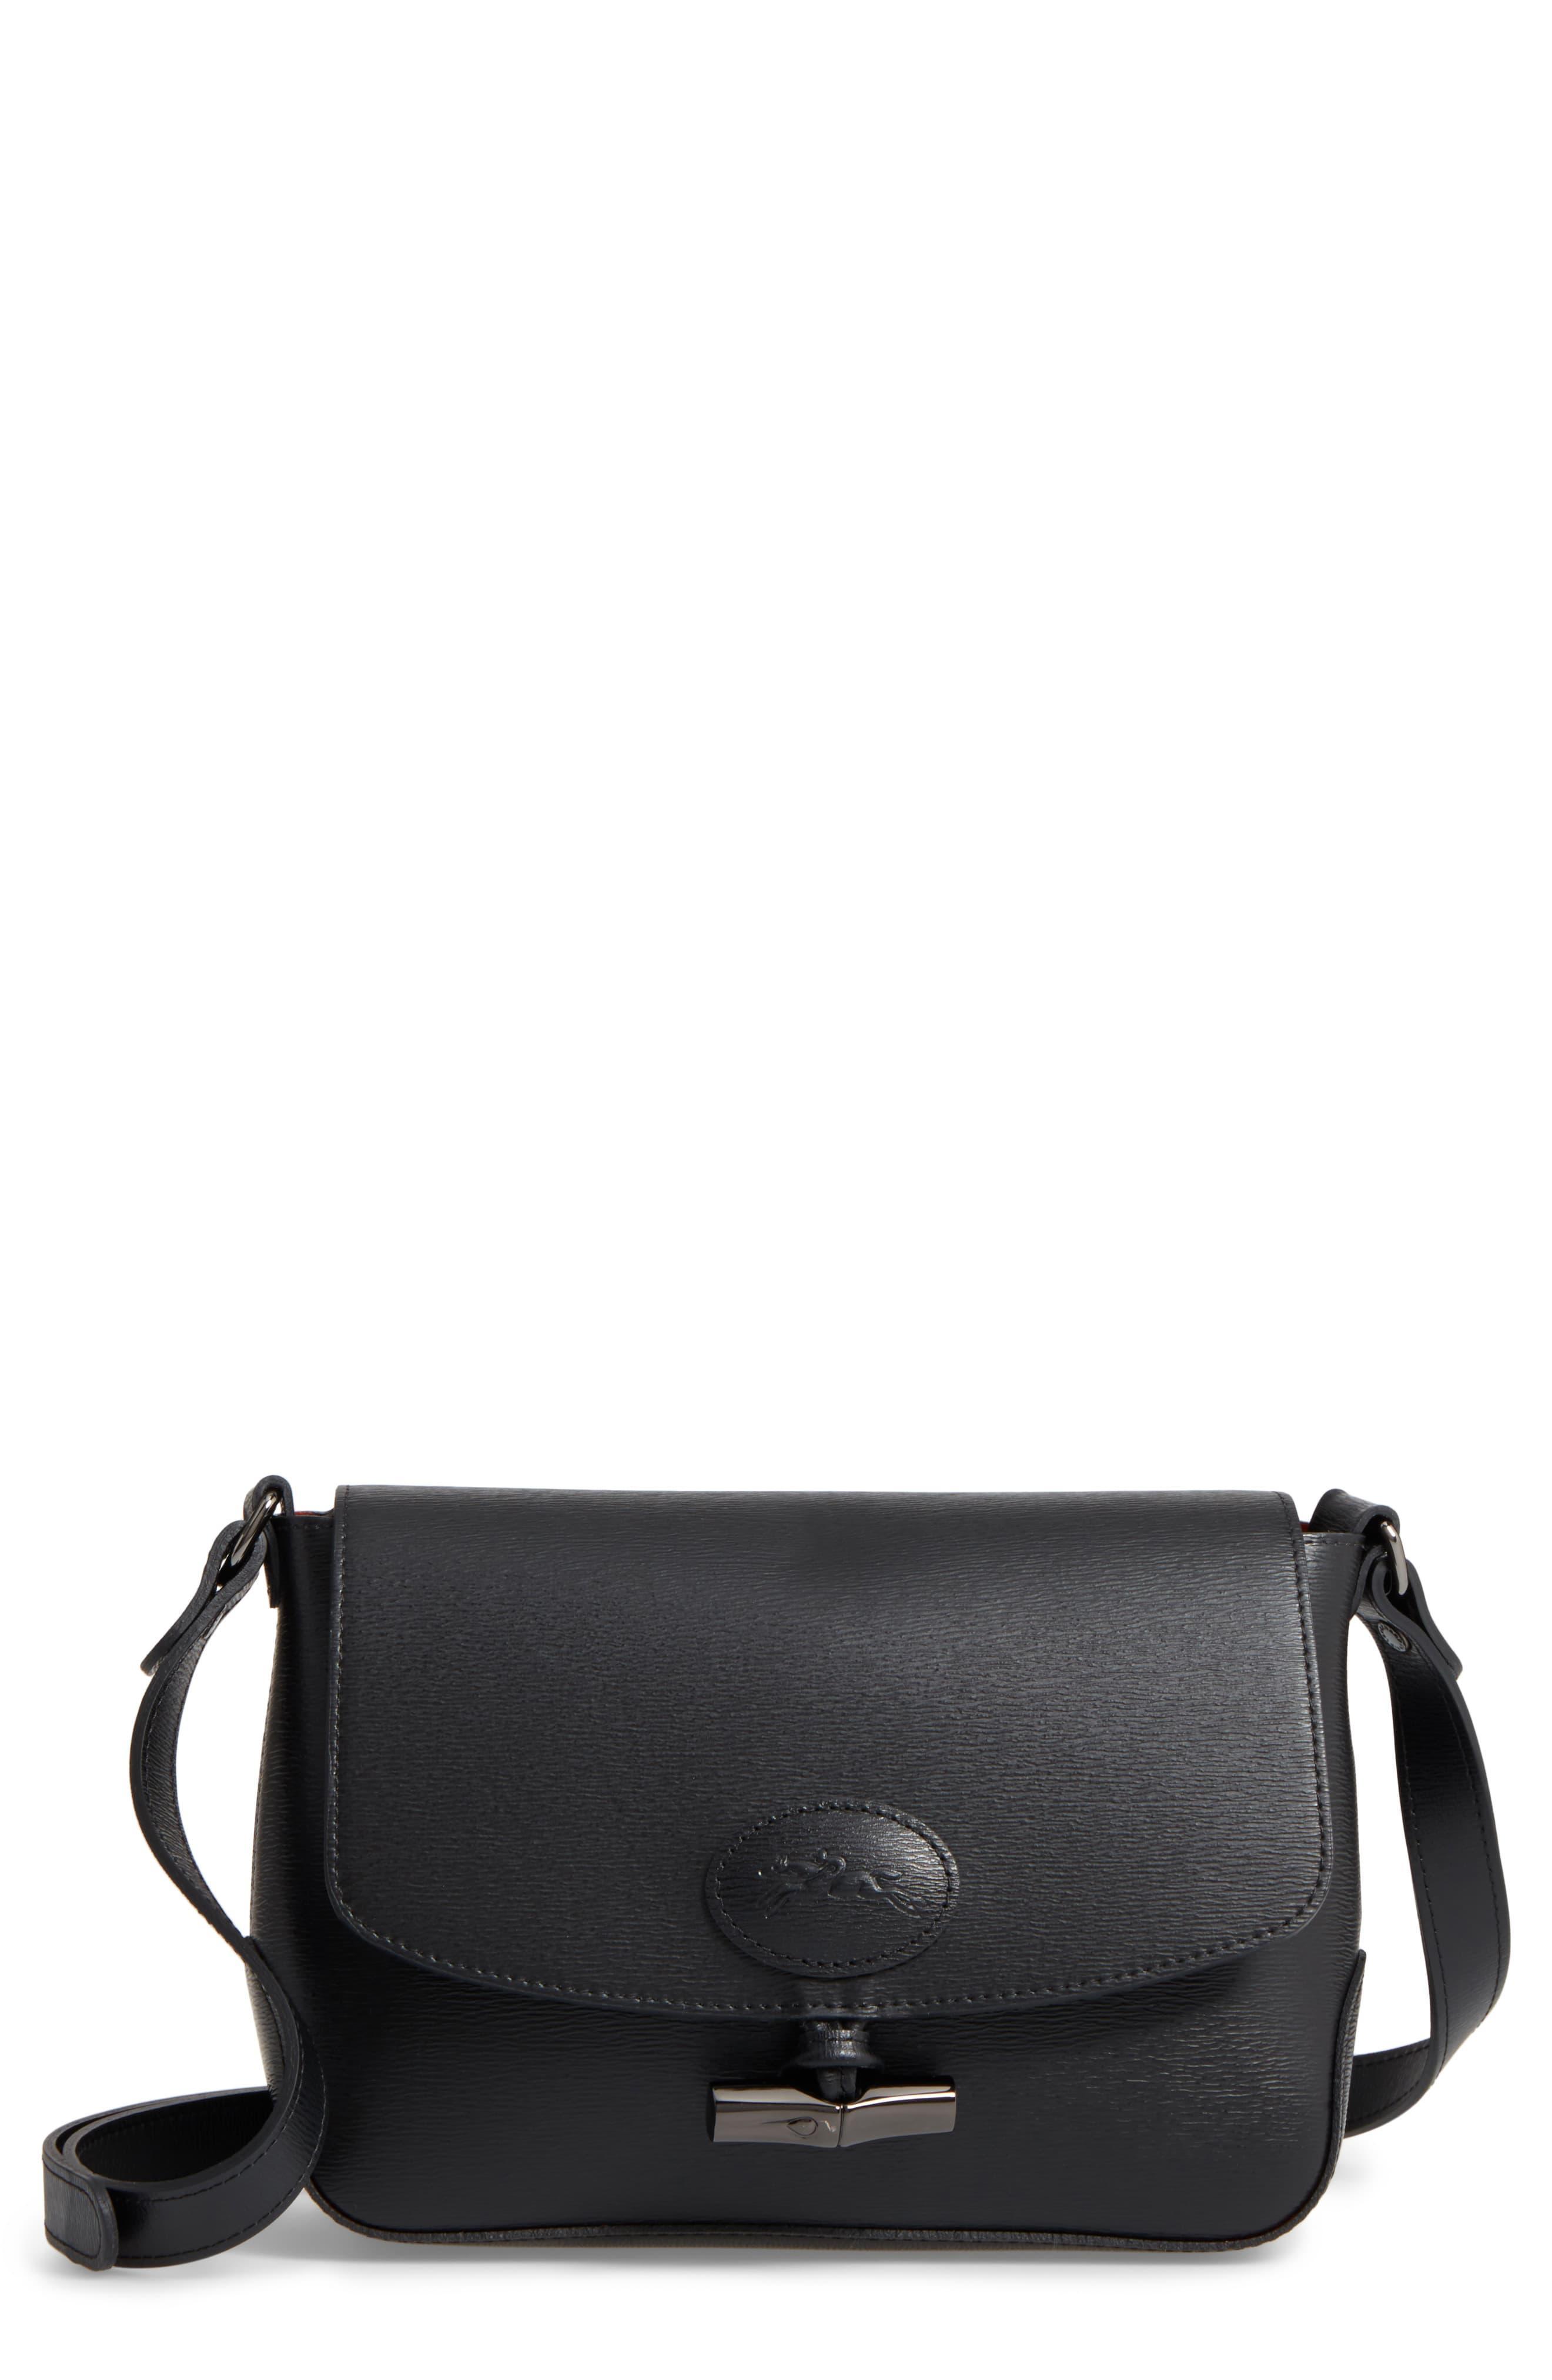 caf899f83 ... Longchamp - Black Roseau Leather Crossbody Bag - Lyst · Visit  Nordstrom. Tap to visit site